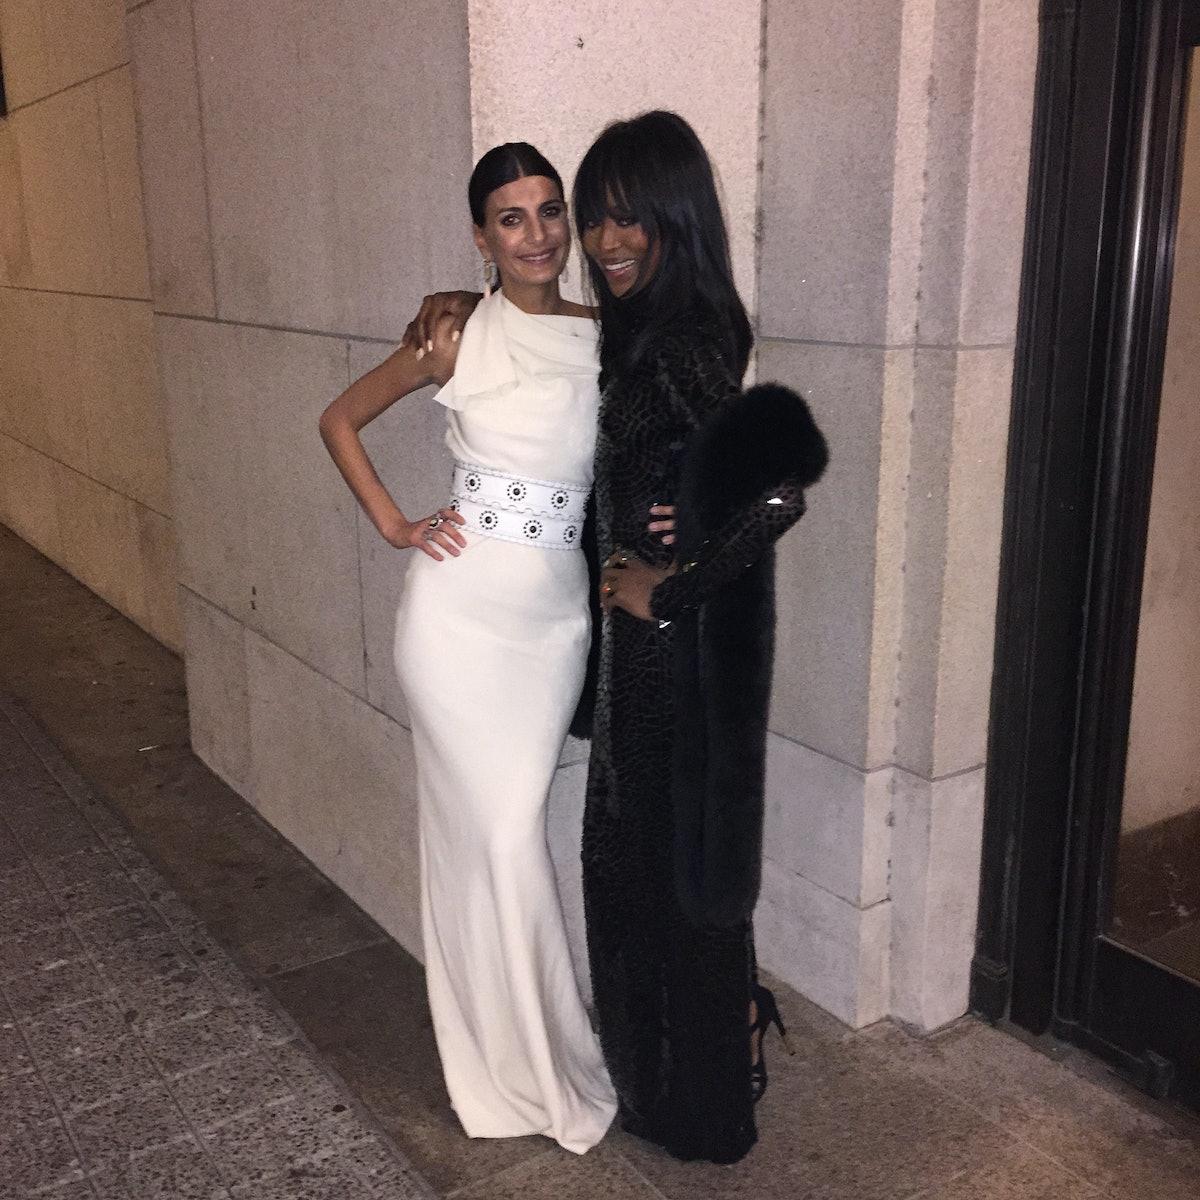 Naomi Campbell and Giovanna Battaglia